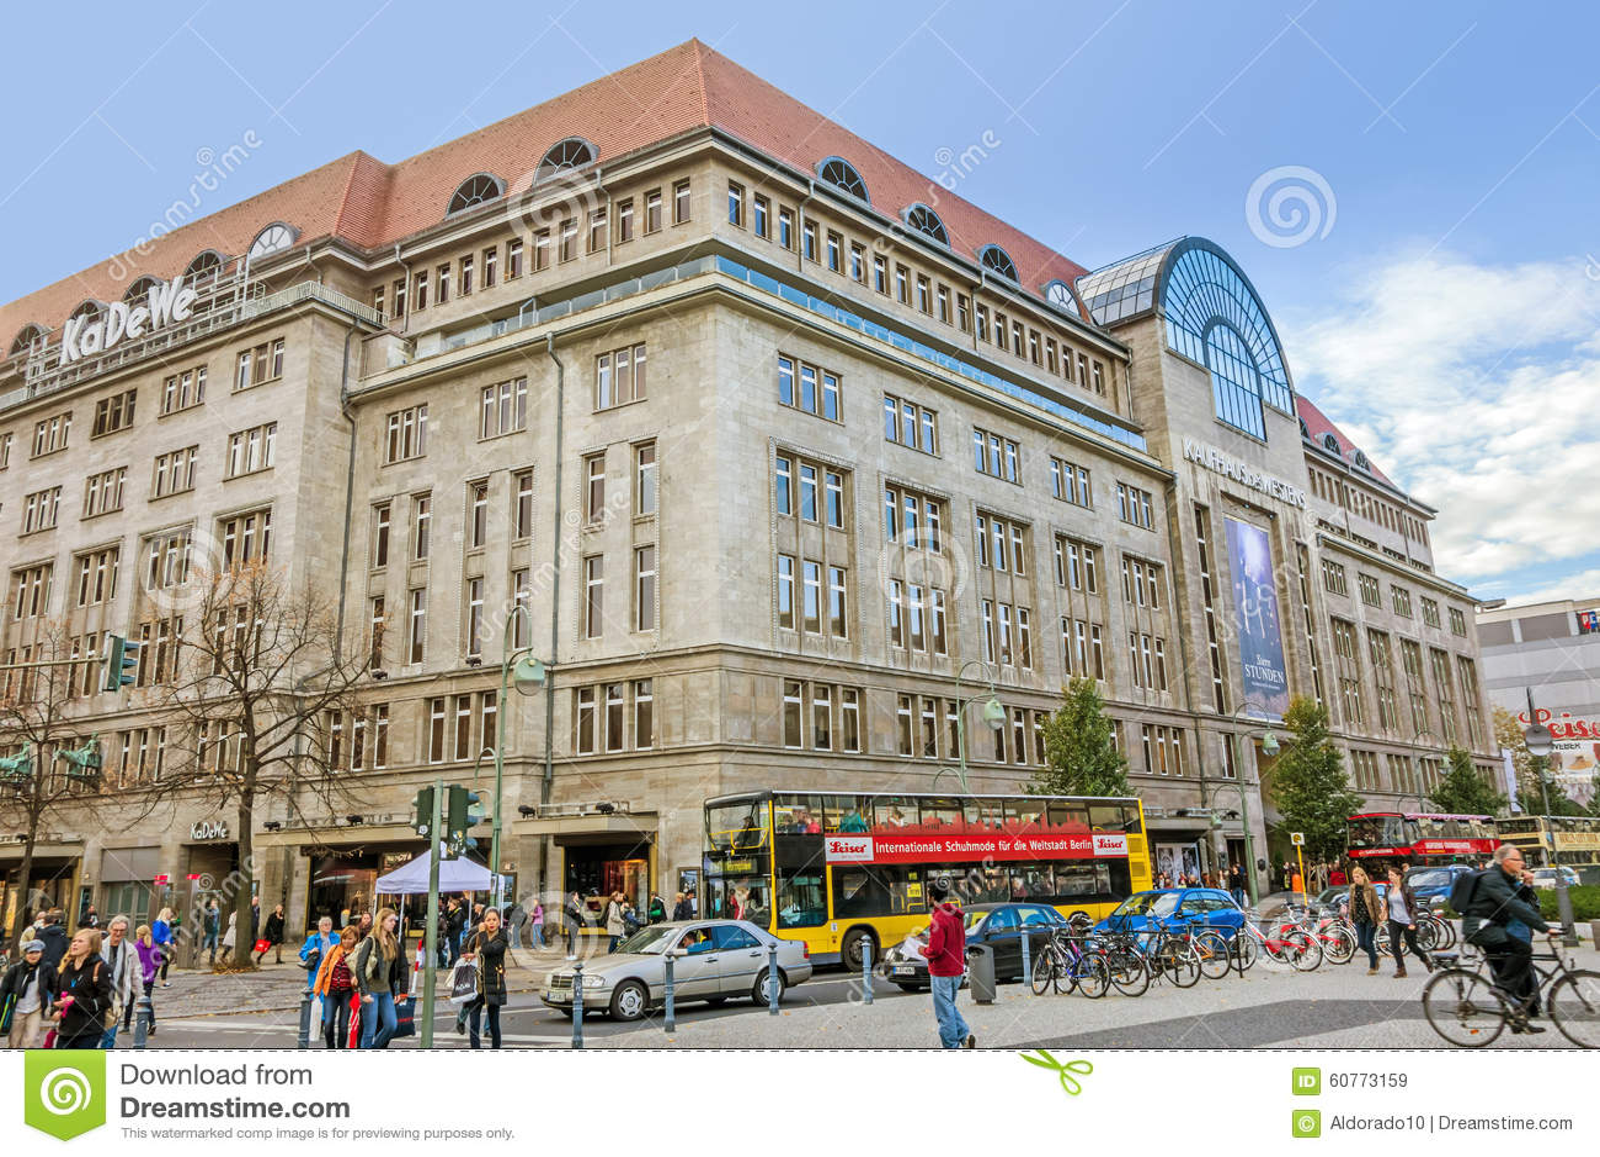 shopping mall kadewe kaufhaus des westens berlin editorial stock image image 60773159. Black Bedroom Furniture Sets. Home Design Ideas